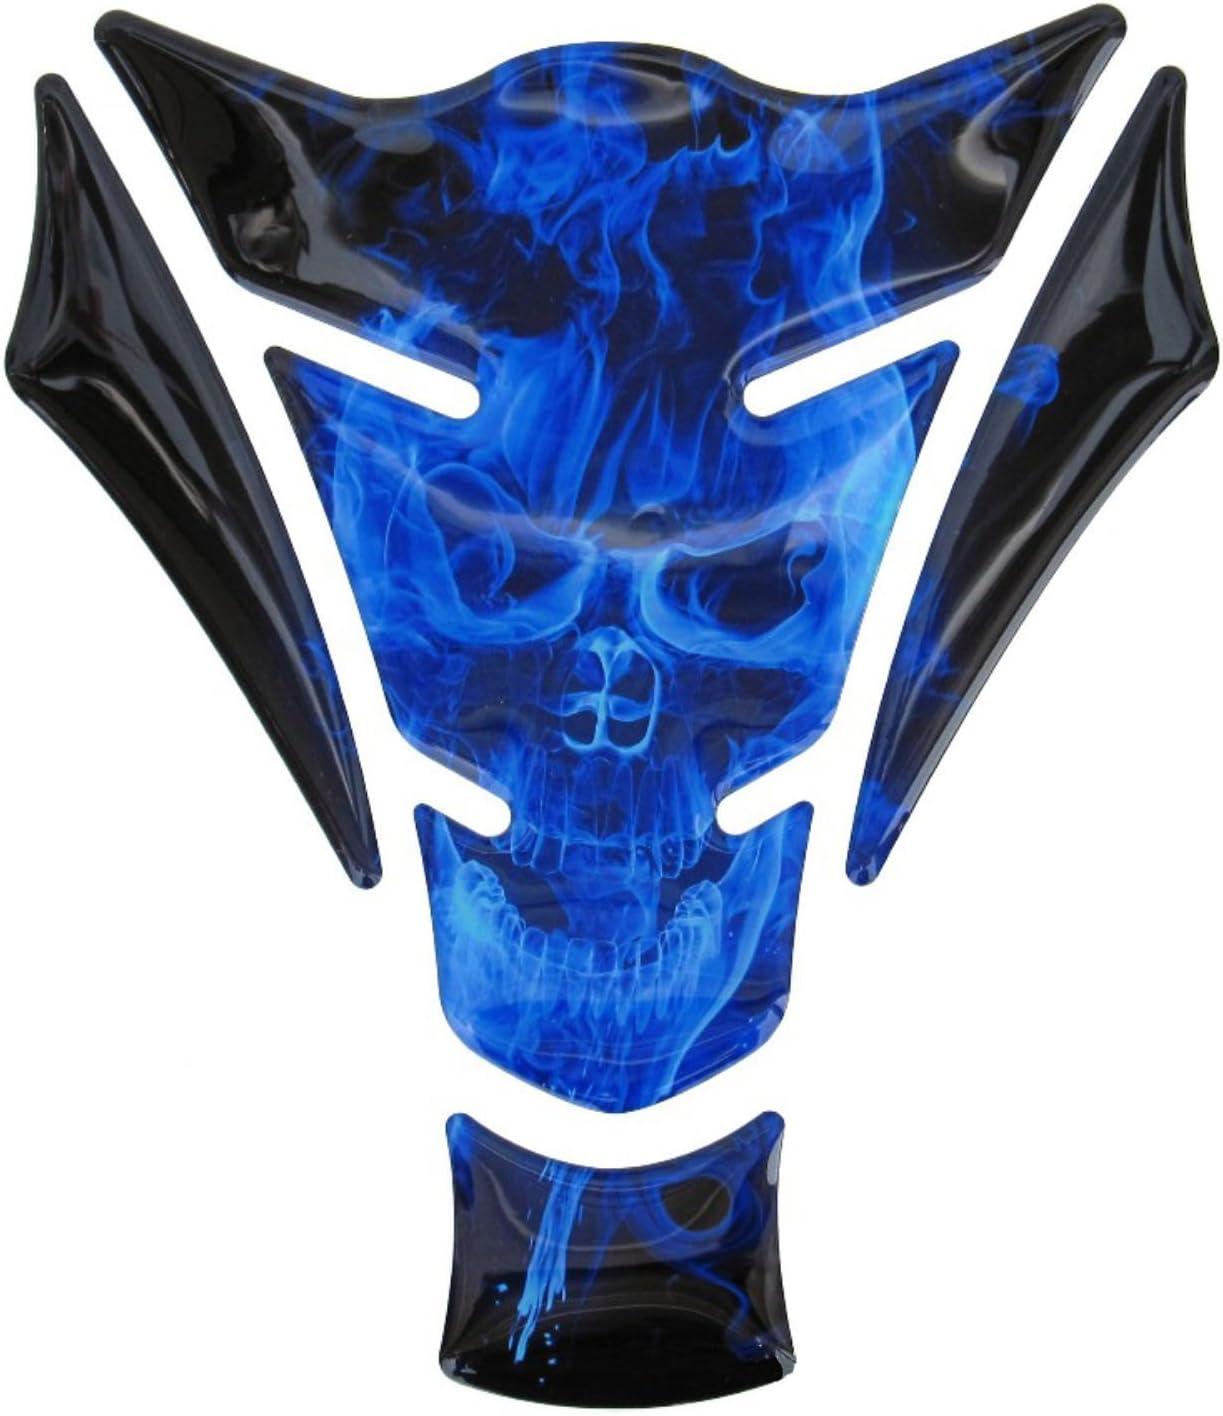 Tankpad 3d 500060 Ghost Blue Totenkopf Motiv Flammen Blau Universell Für Motorrad Tanks Auto